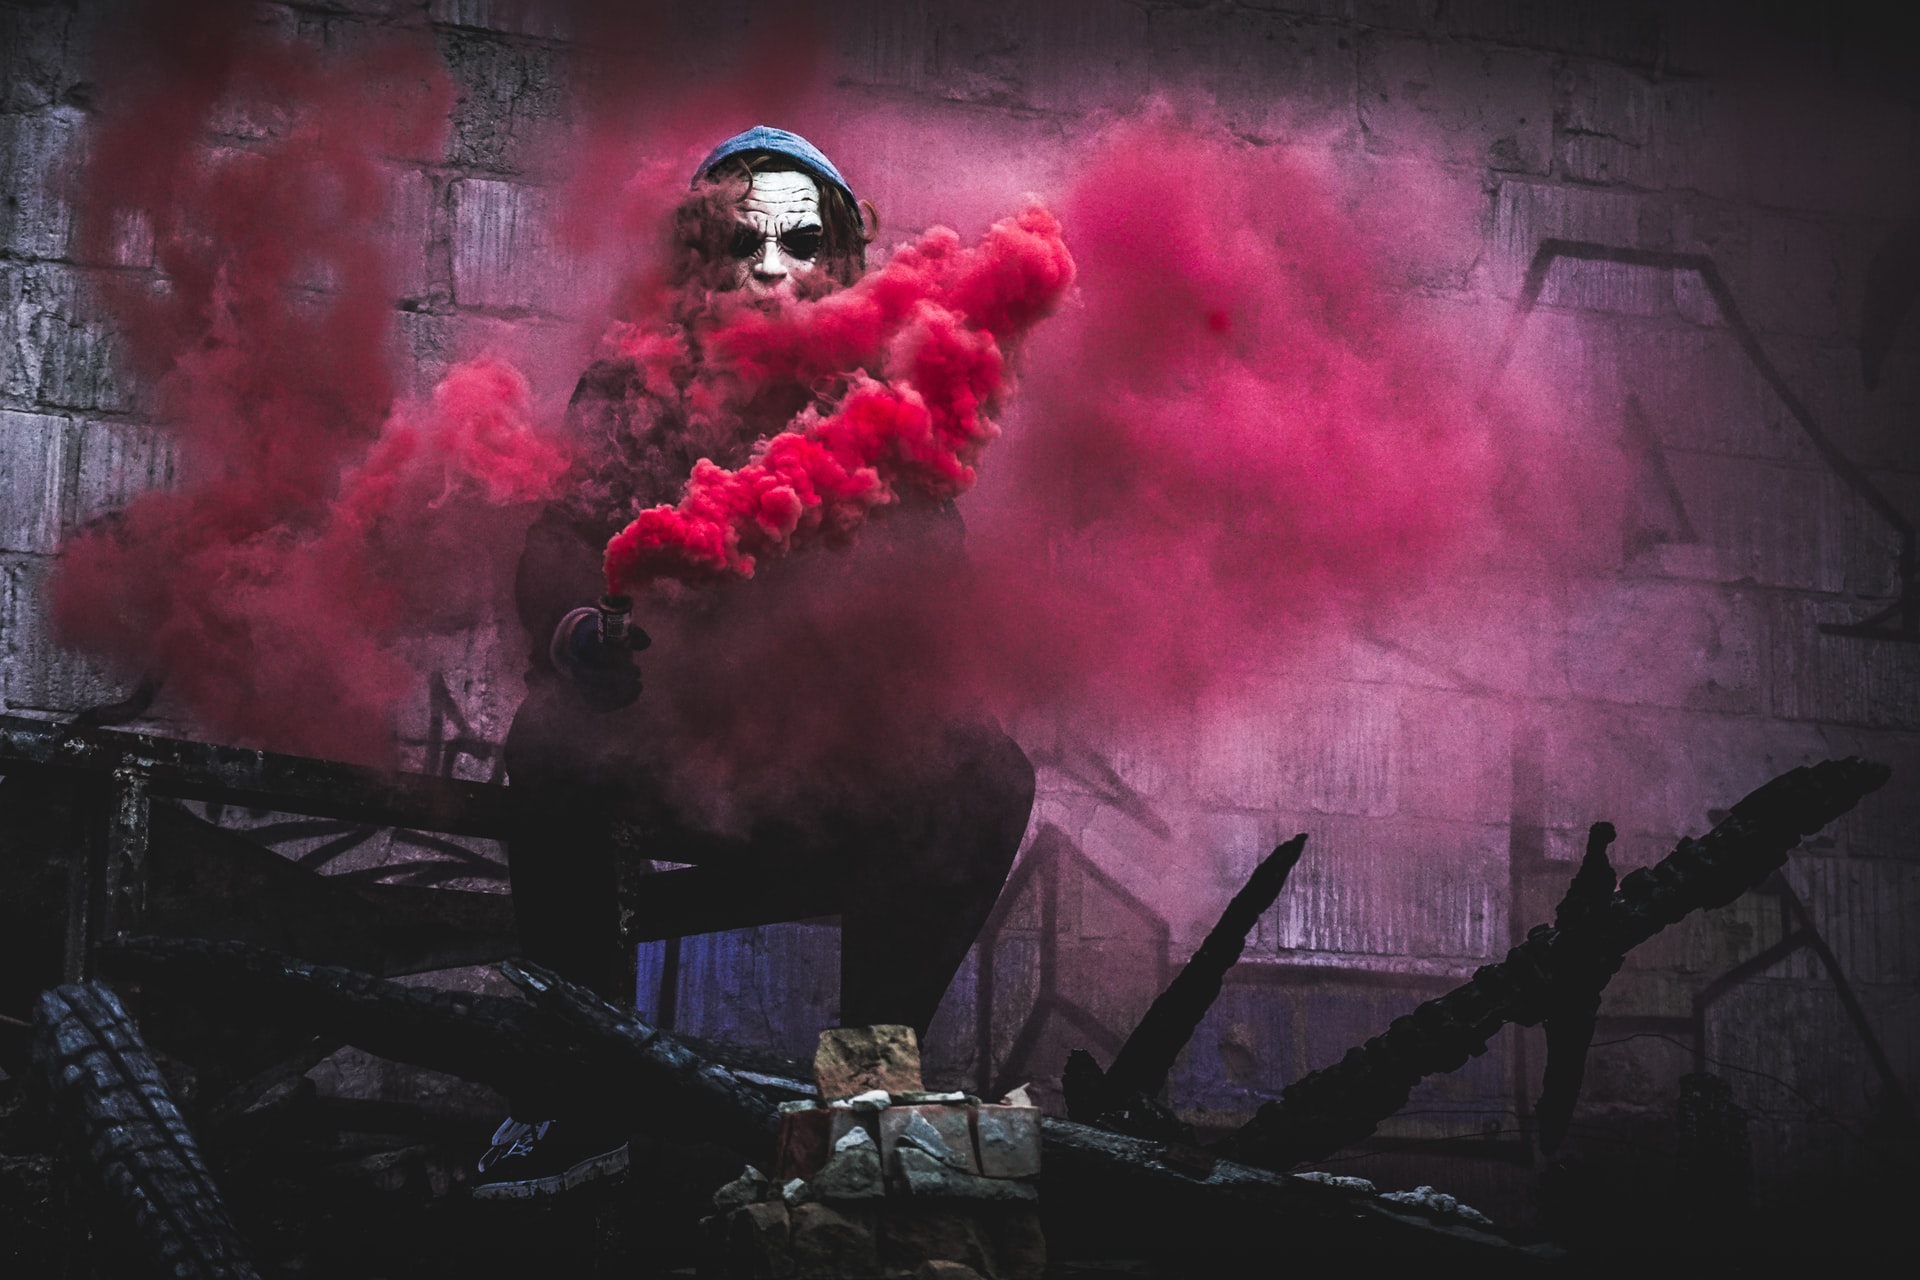 joker-red-smoke